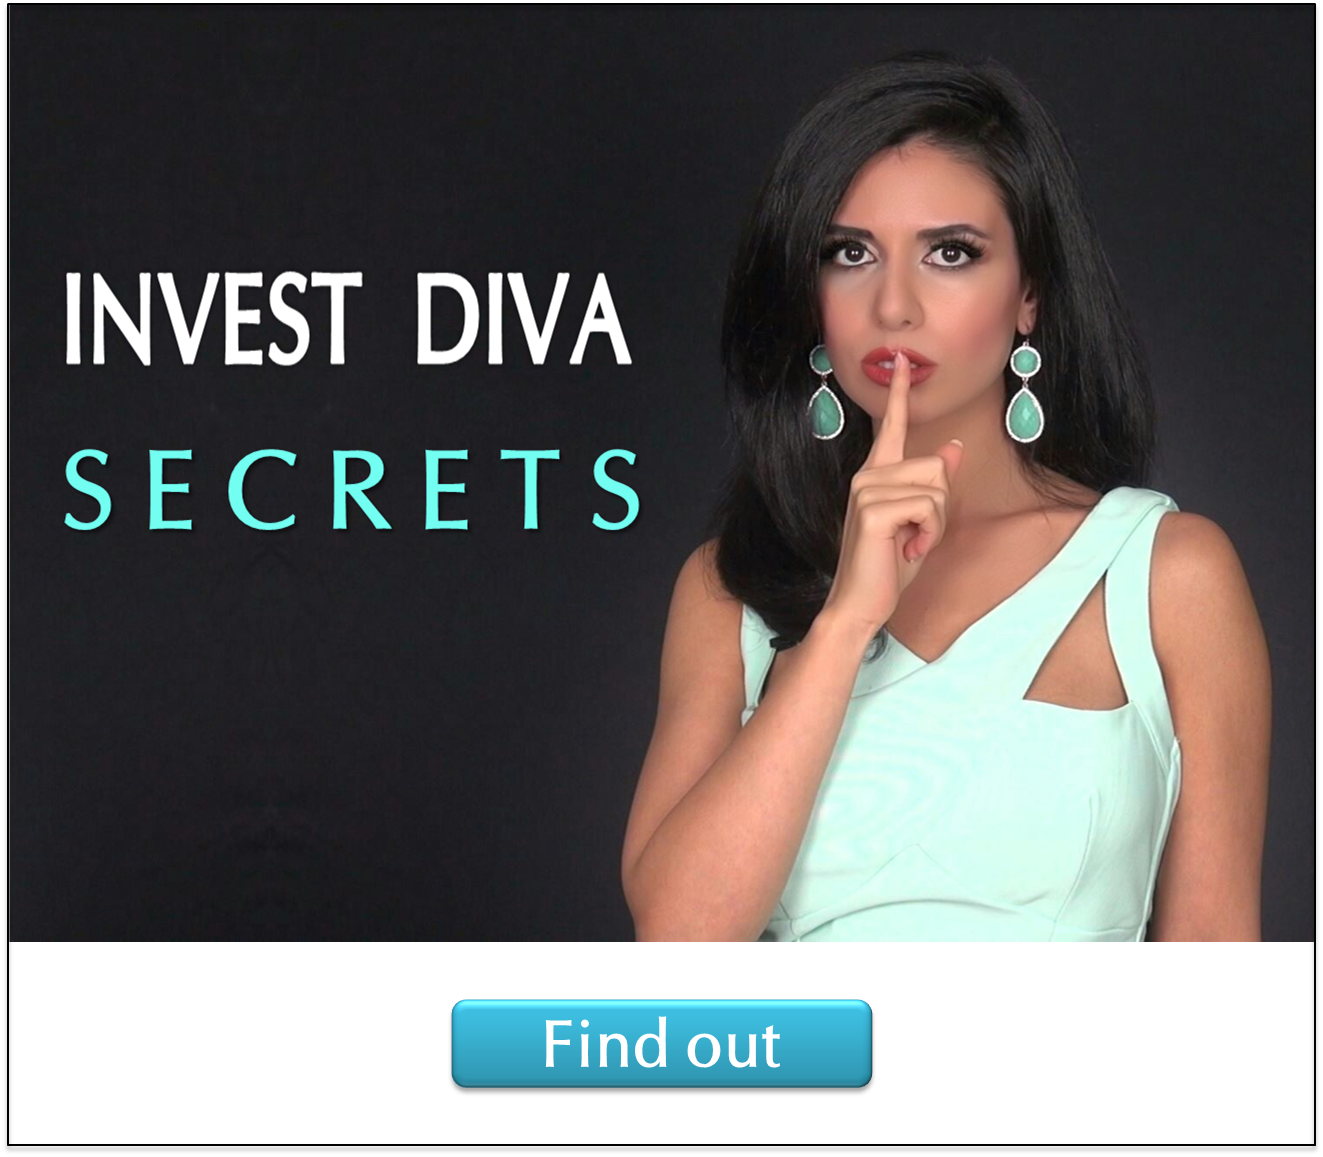 Invest Diva Secrets